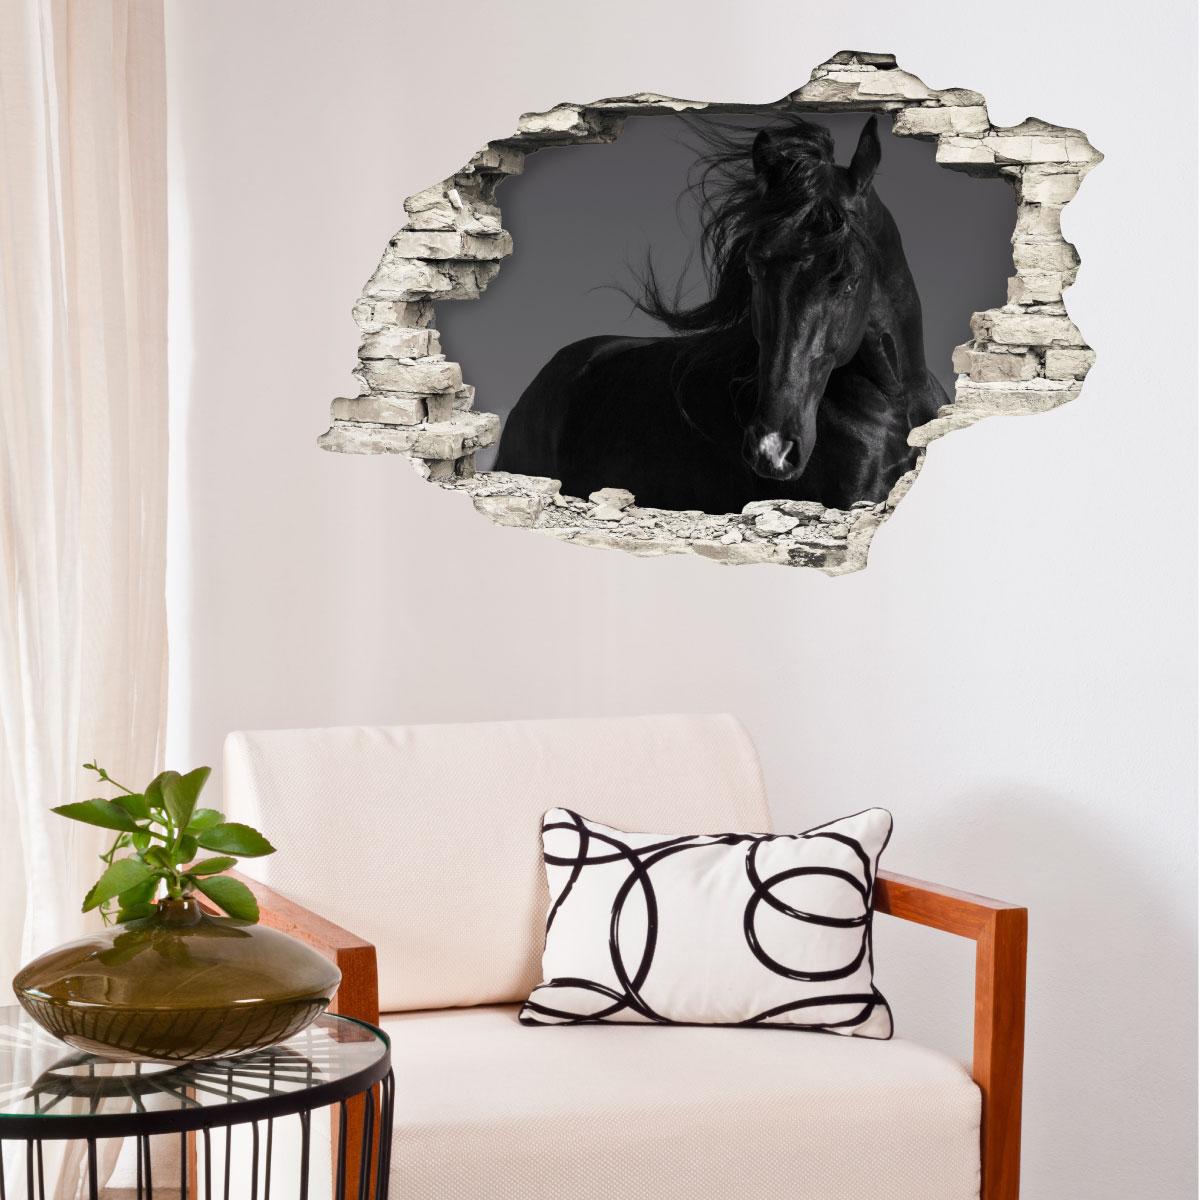 sticker trompe l 39 oeil l 39 talon noir stickers animaux chevaux ambiance sticker. Black Bedroom Furniture Sets. Home Design Ideas